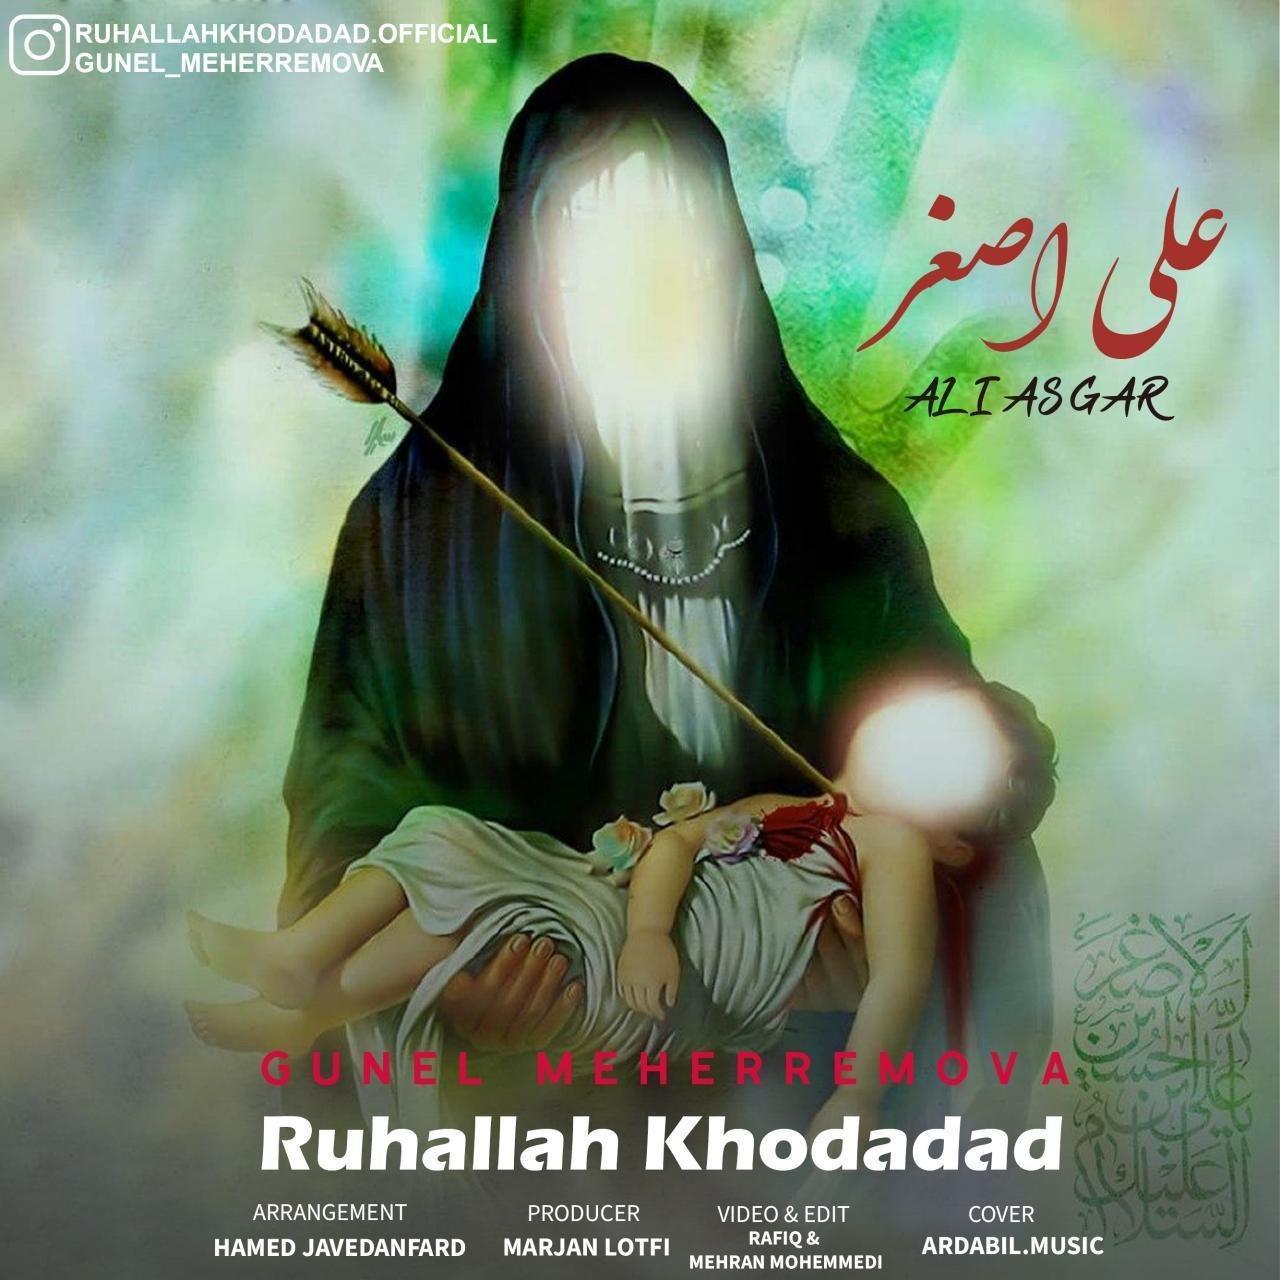 http://s11.picofile.com/file/8407336834/12Ruhallah_Khodadad_Ft_Gunel_Meherremova_Ali_Asgar.jpg